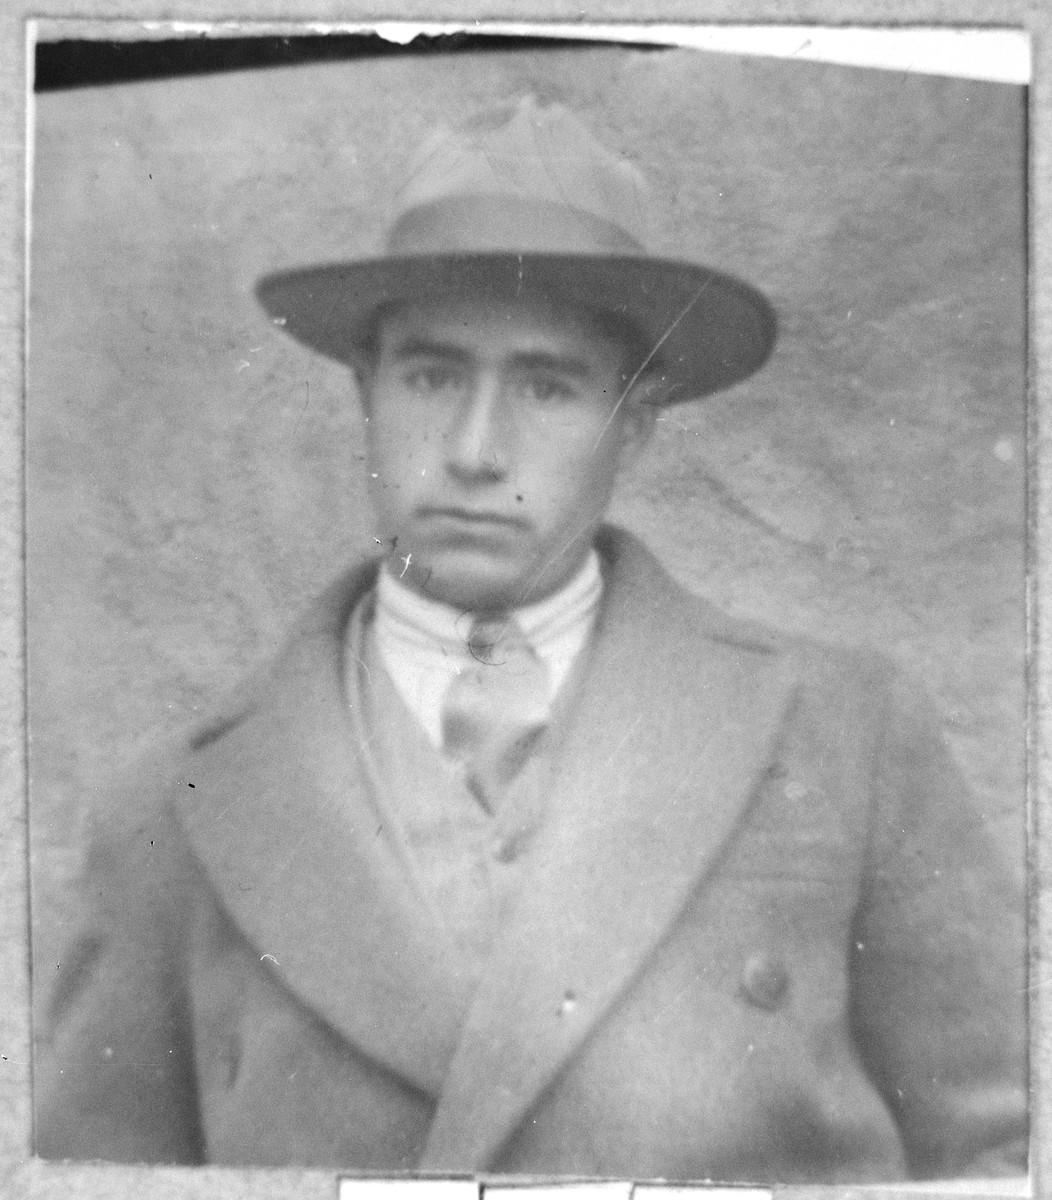 Portrait of Mois Testa, son of Mordechai Testa.  He was a tailor.  He lived at Asadbegova 1 in Bitola.